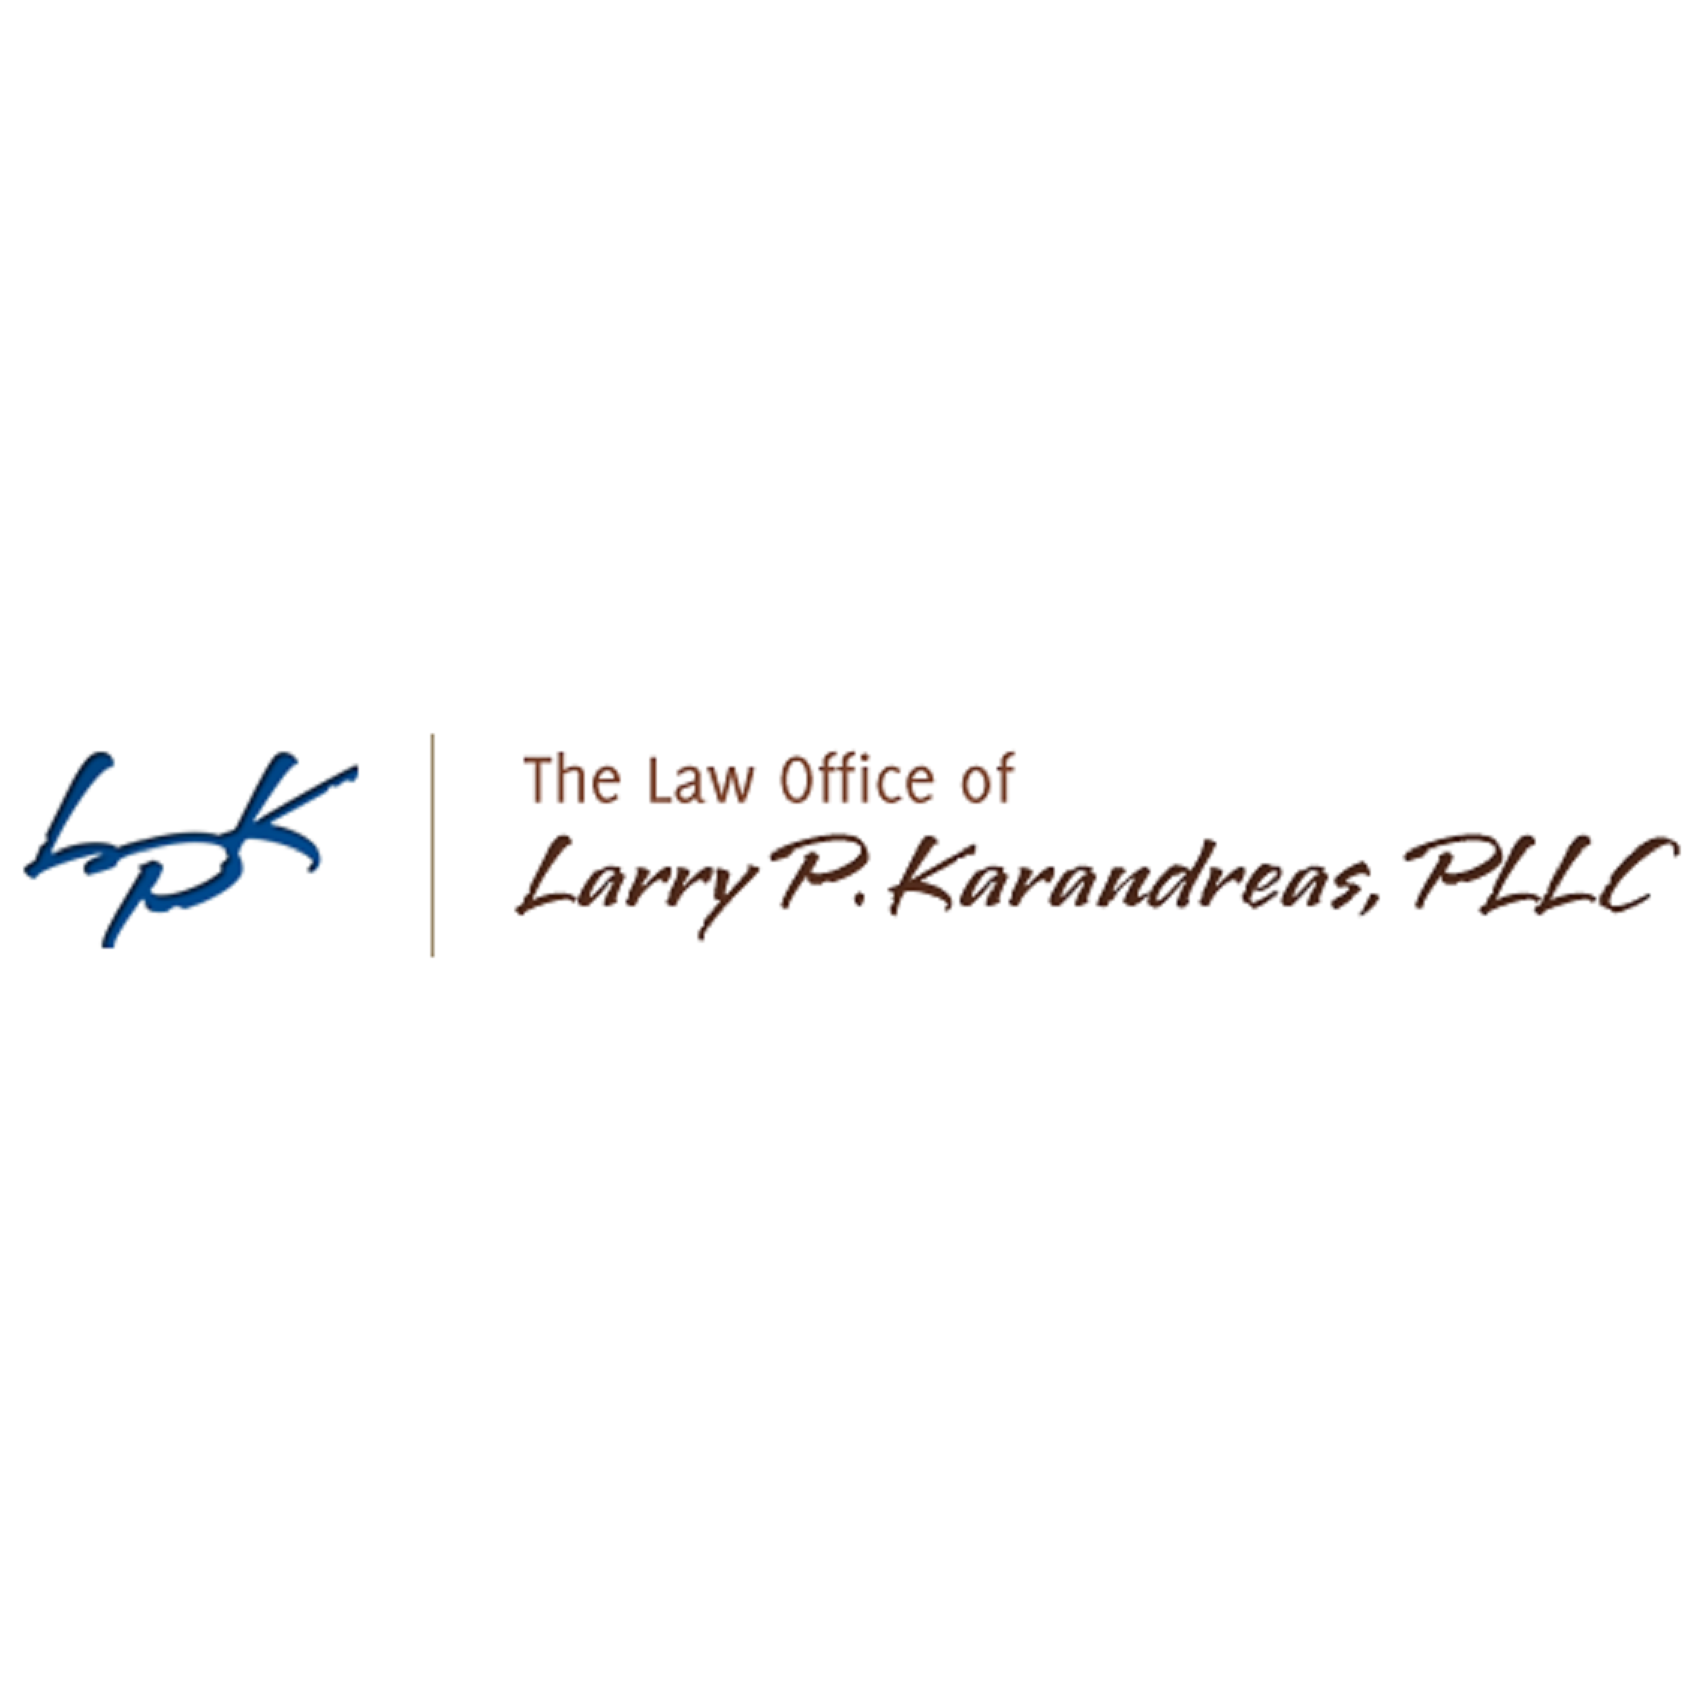 Law Office of Larry P. Karandreas, PLLC - Phoenix, AZ - Attorneys